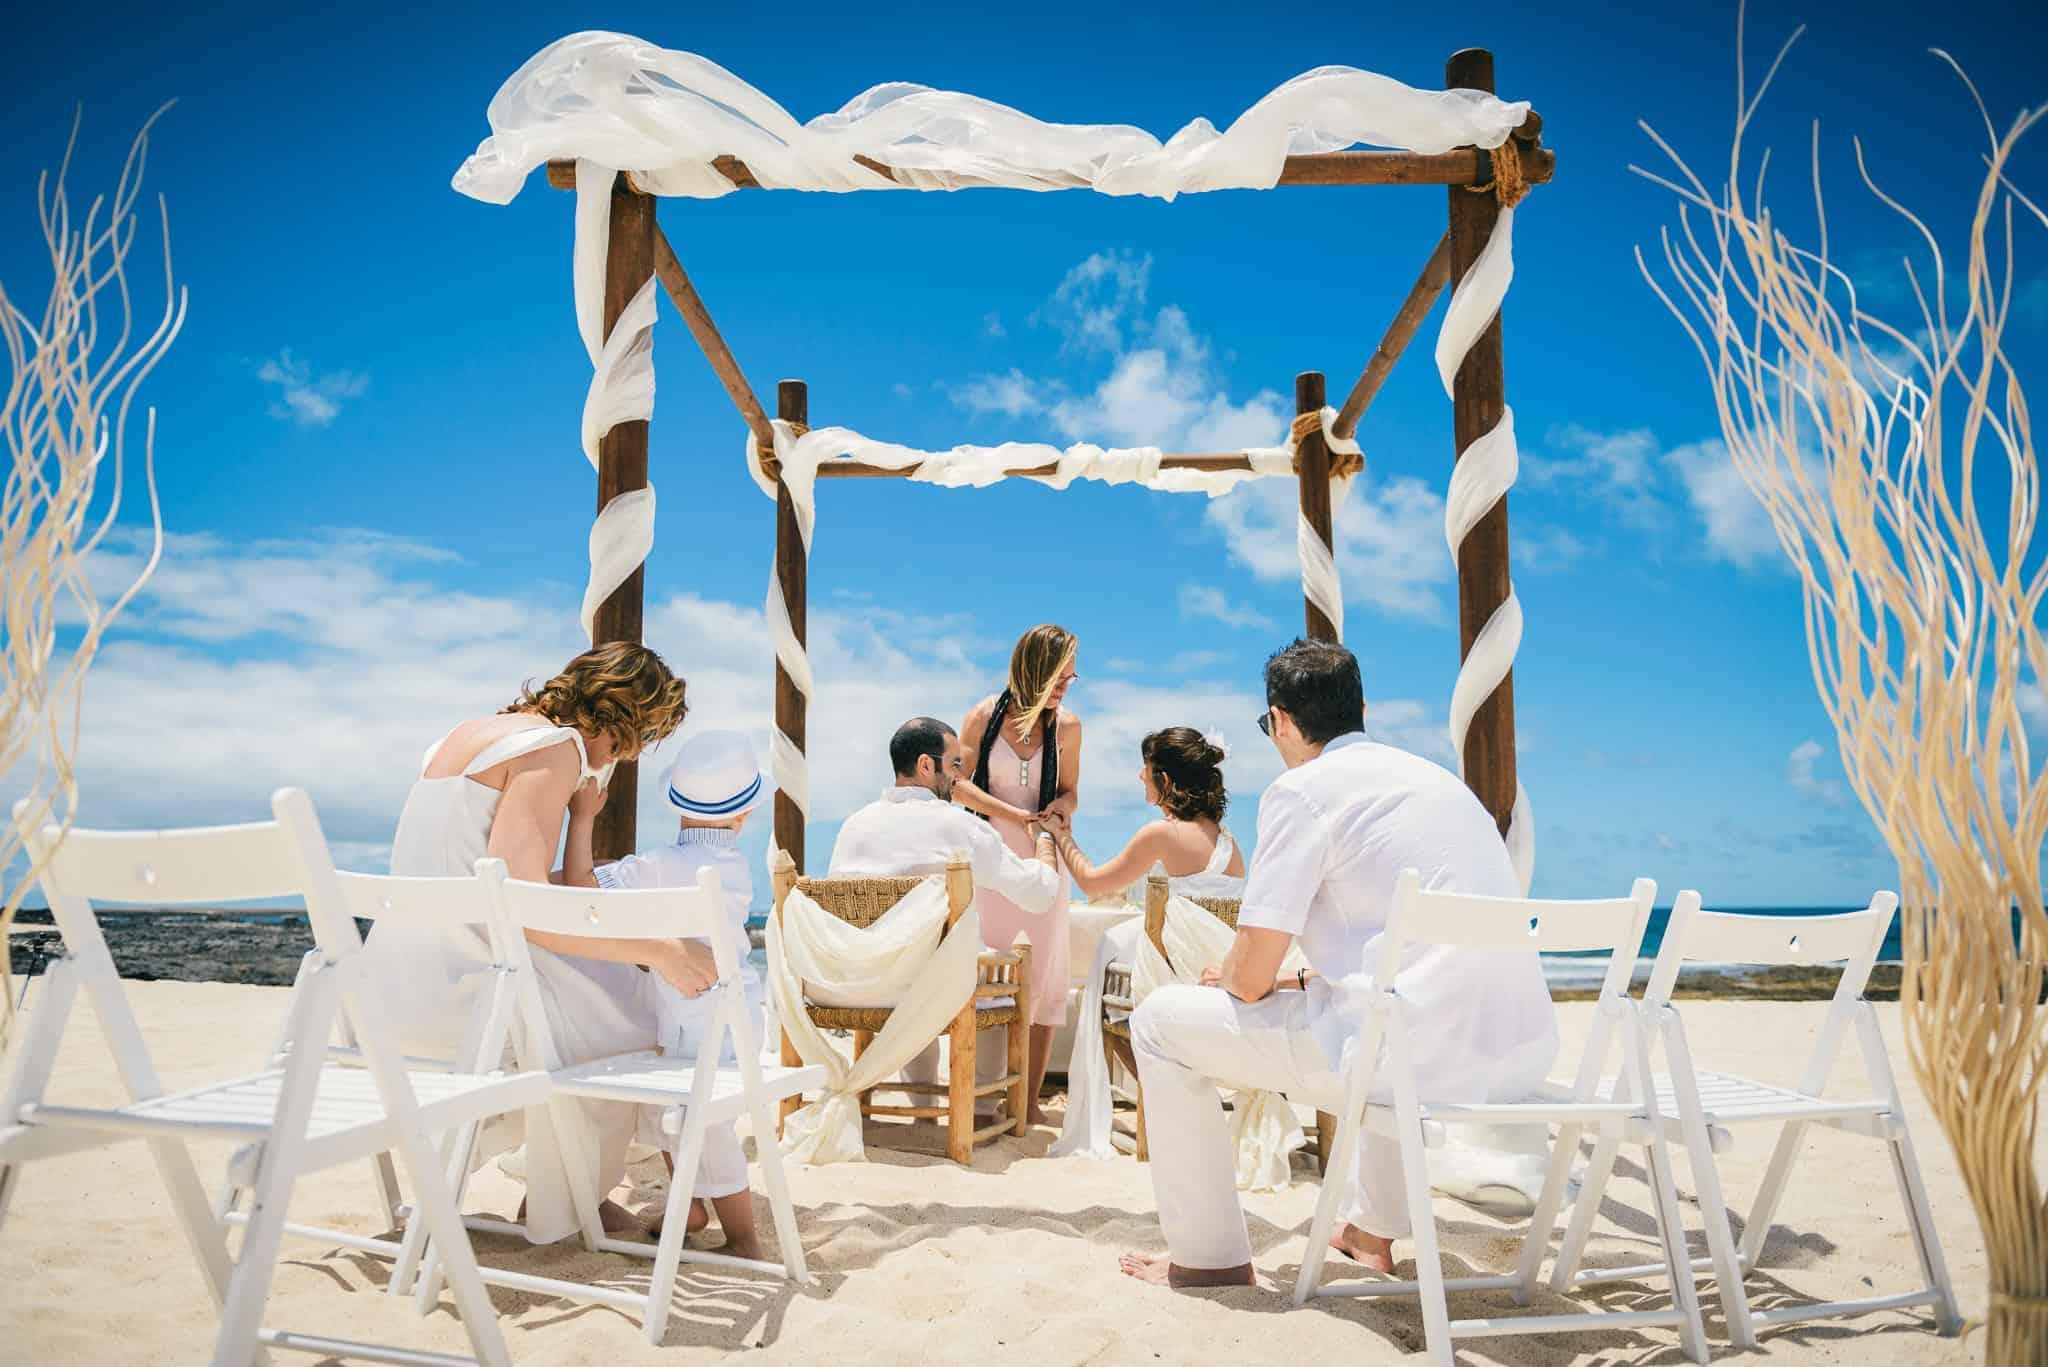 Renewal of the Vows in Spanje - Fuerteventura